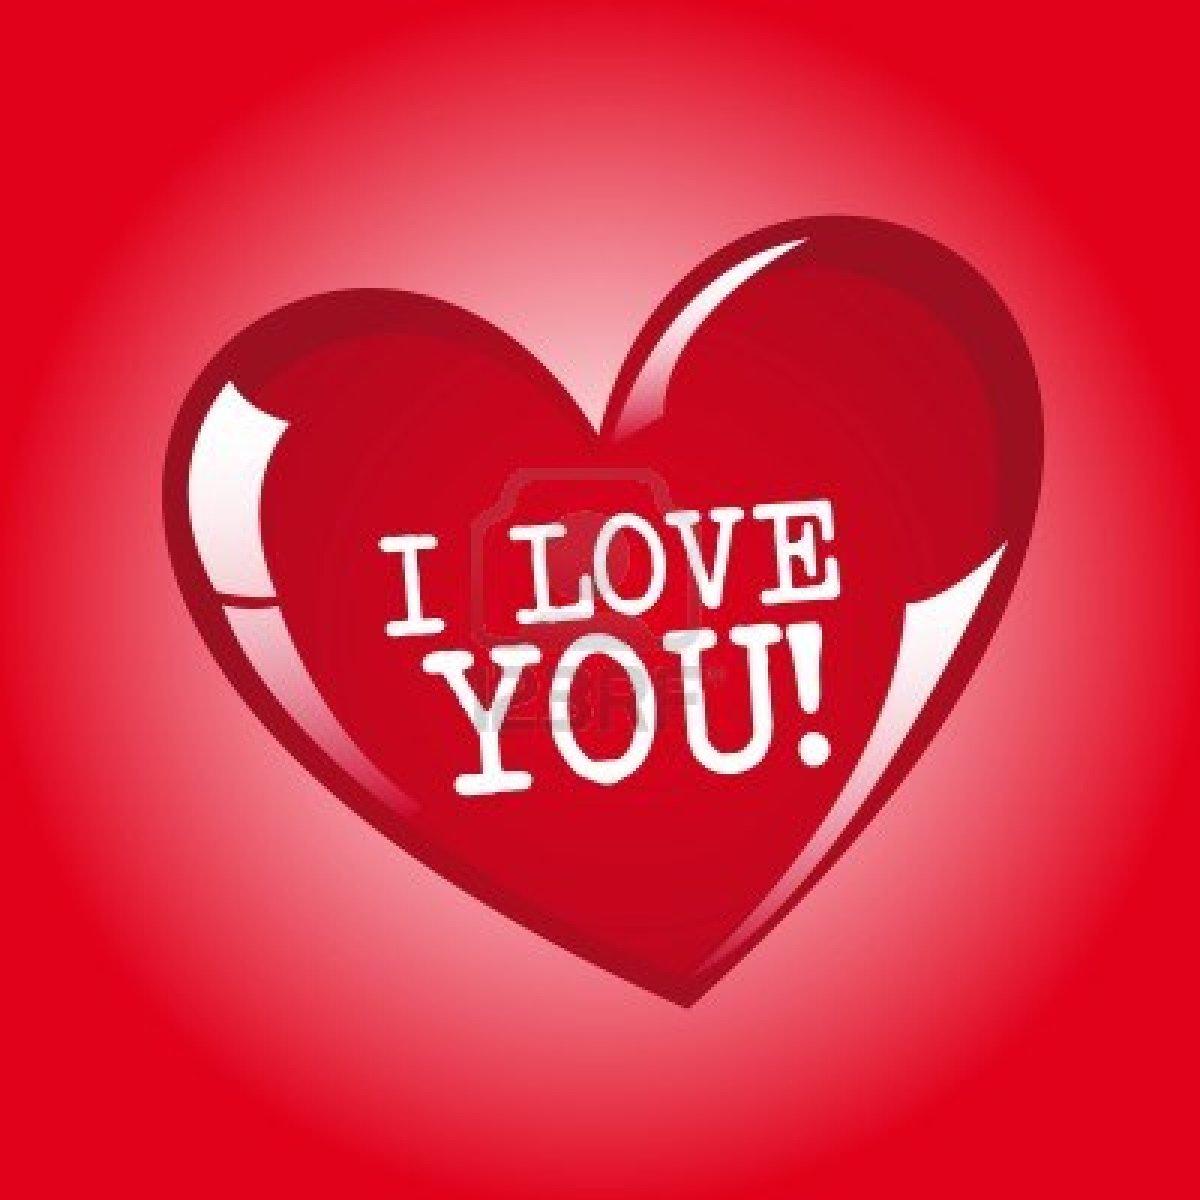 wonderful love you image